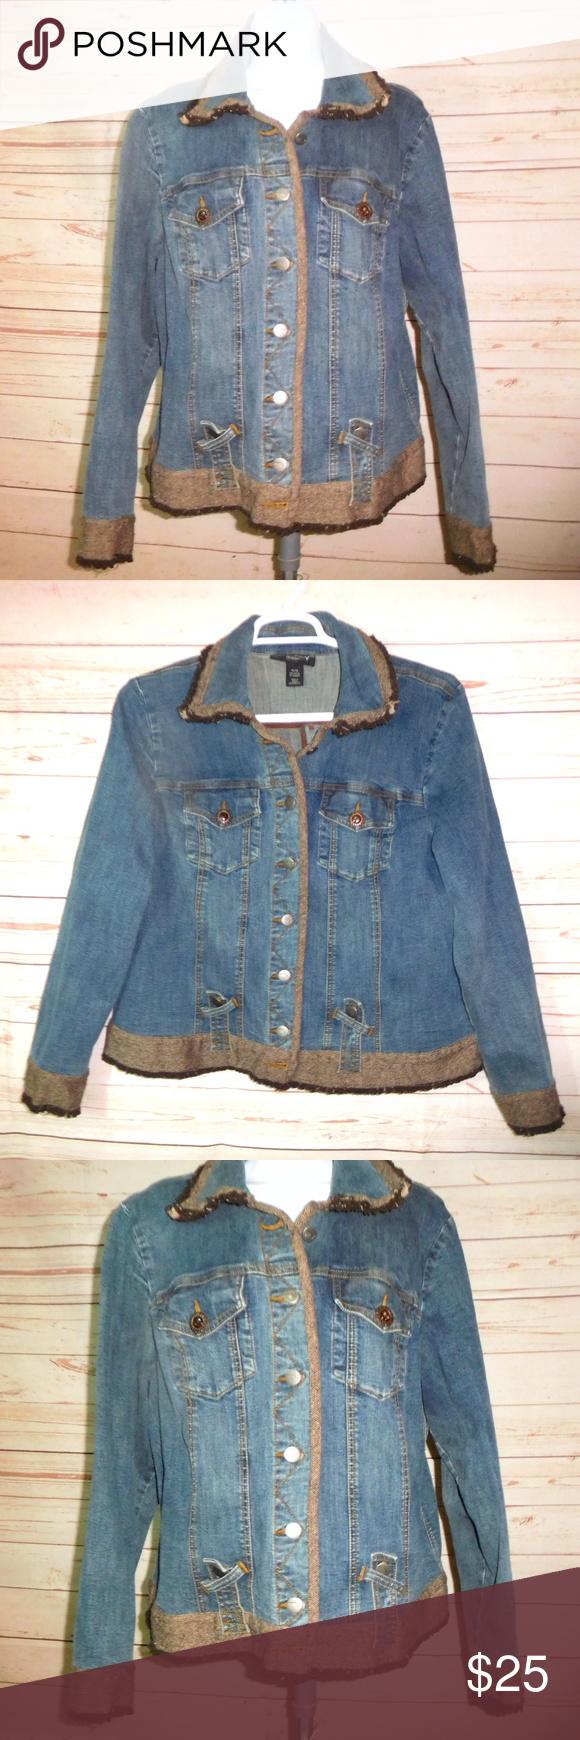 Venezia By Lane Bryant Denim Jean Jacket 14 16 Denim Jean Jacket Clothes Design Lane Bryant [ 1740 x 580 Pixel ]